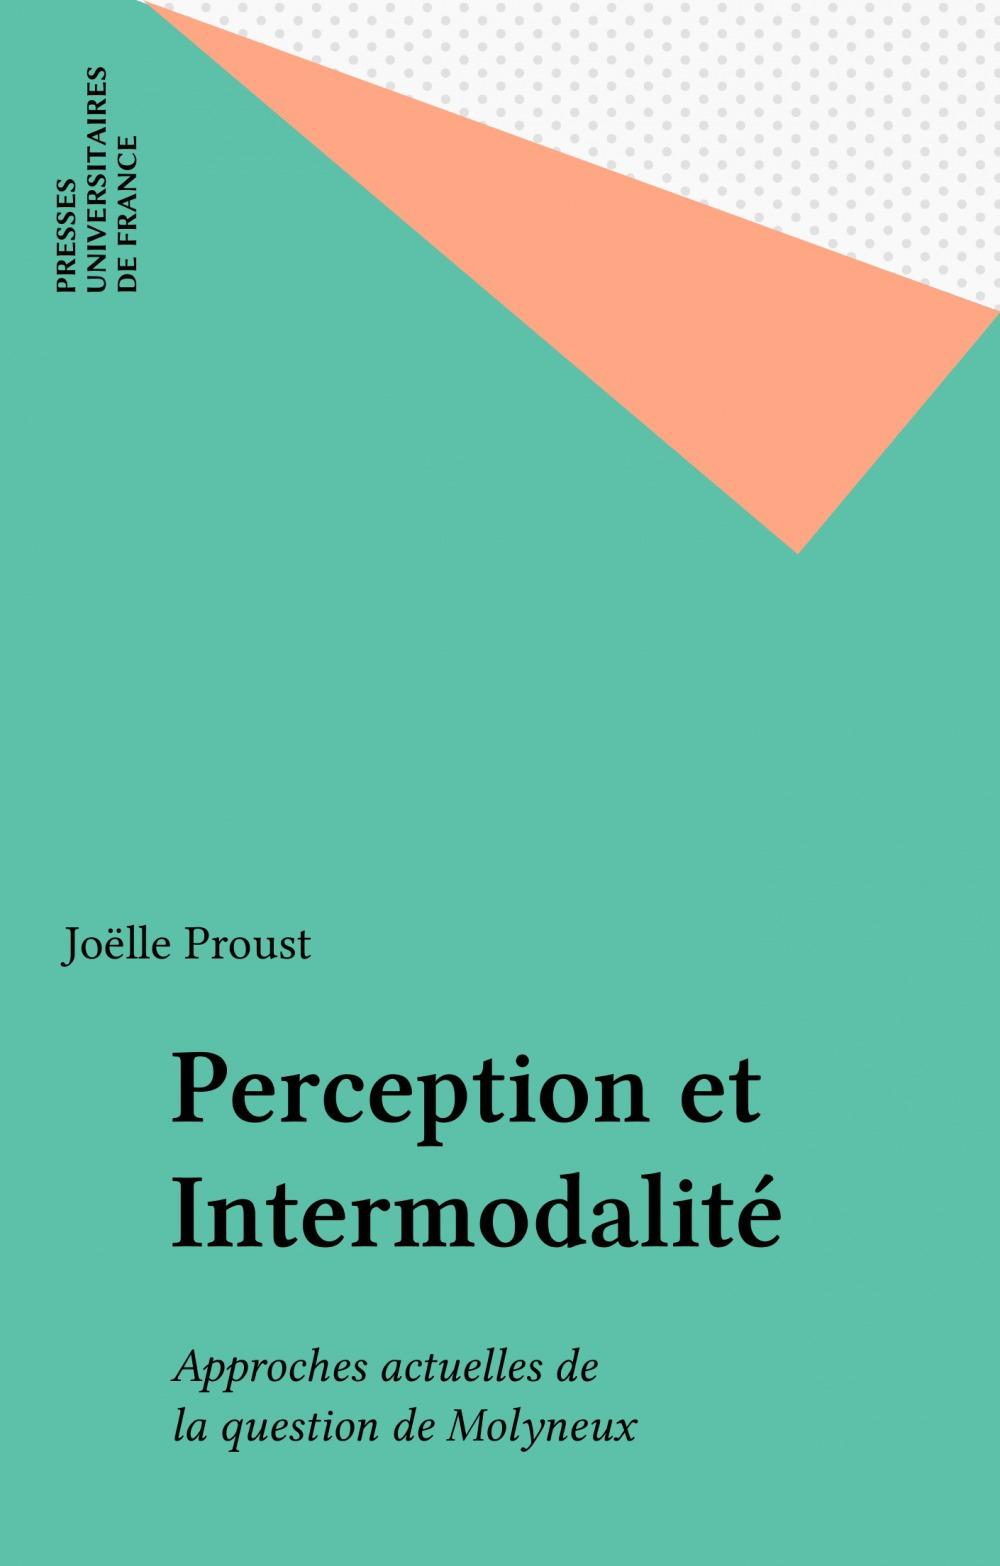 Perception et intermodalite